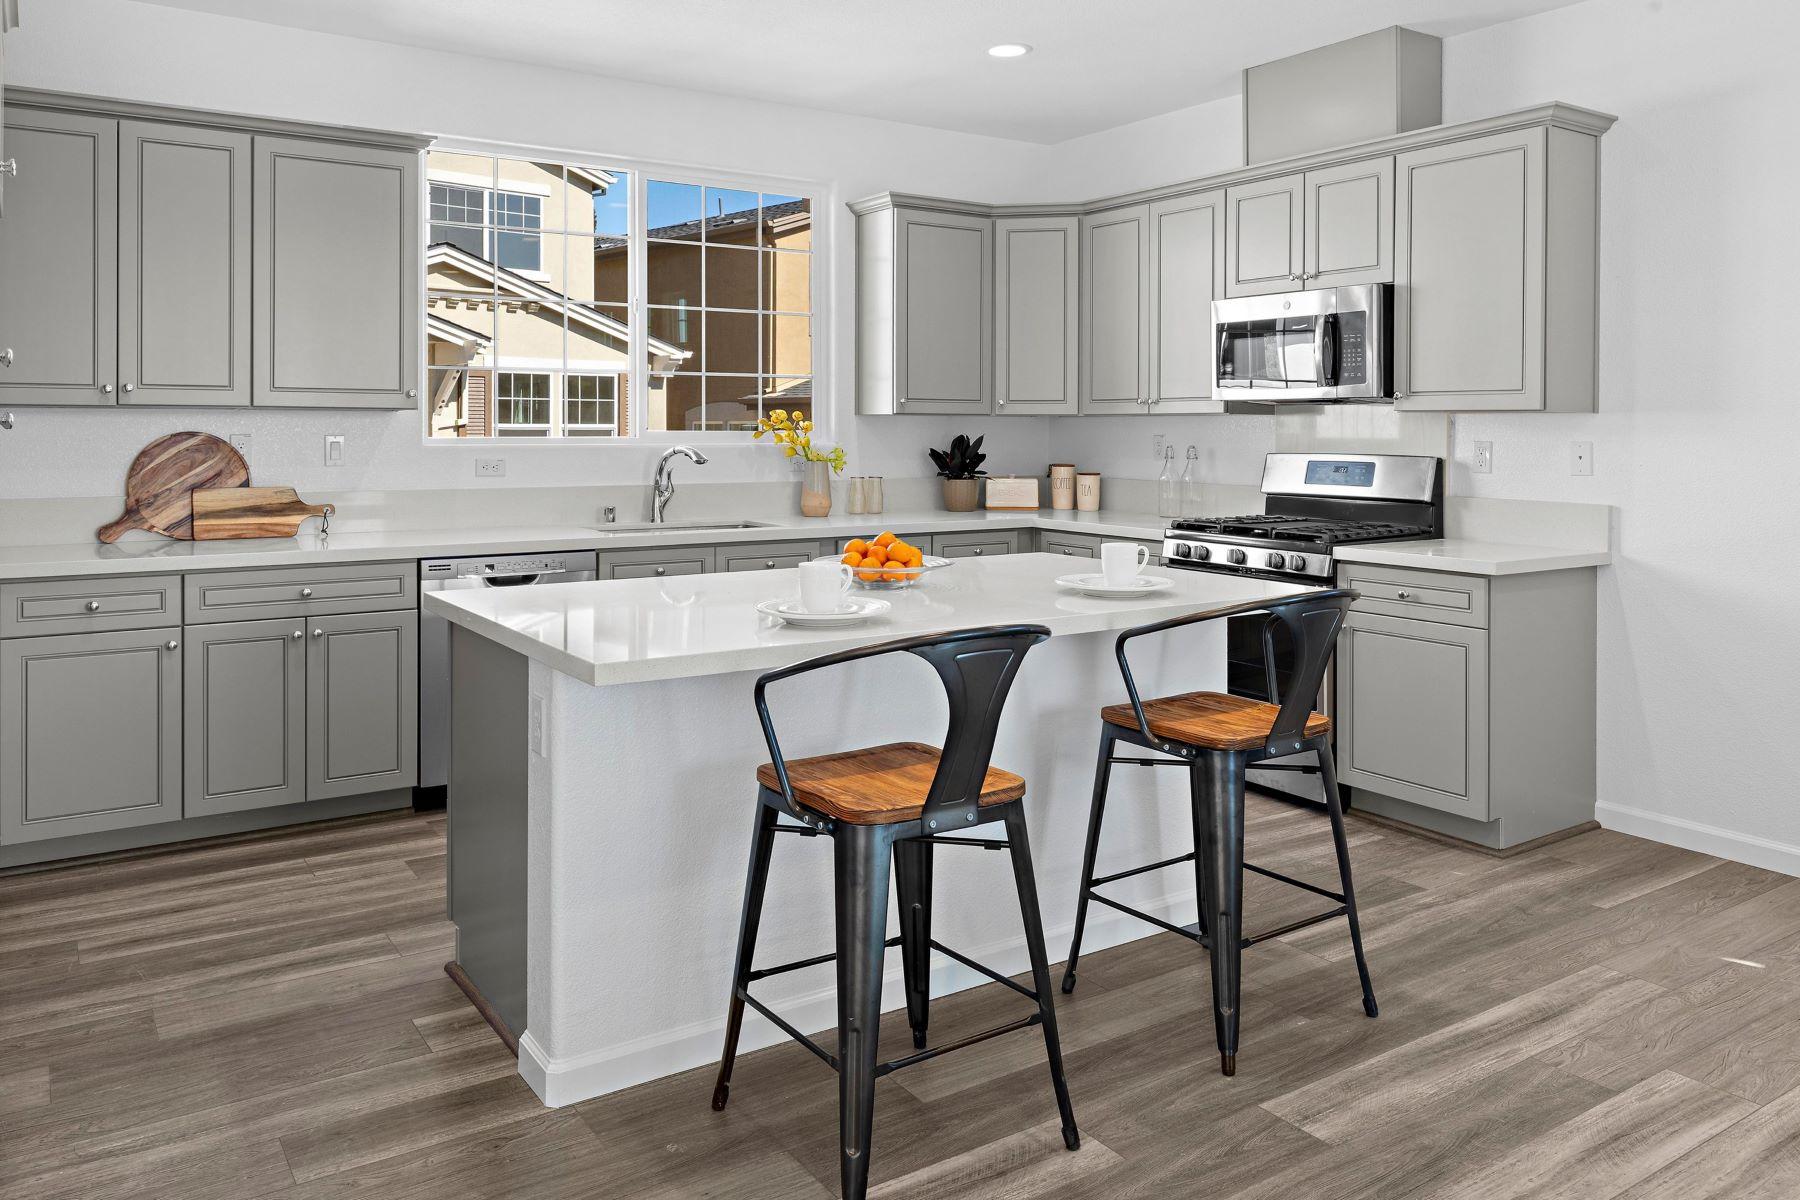 Single Family Homes for Active at New Construction In El Sobrante 472 Colina Way El Sobrante, California 94803 United States